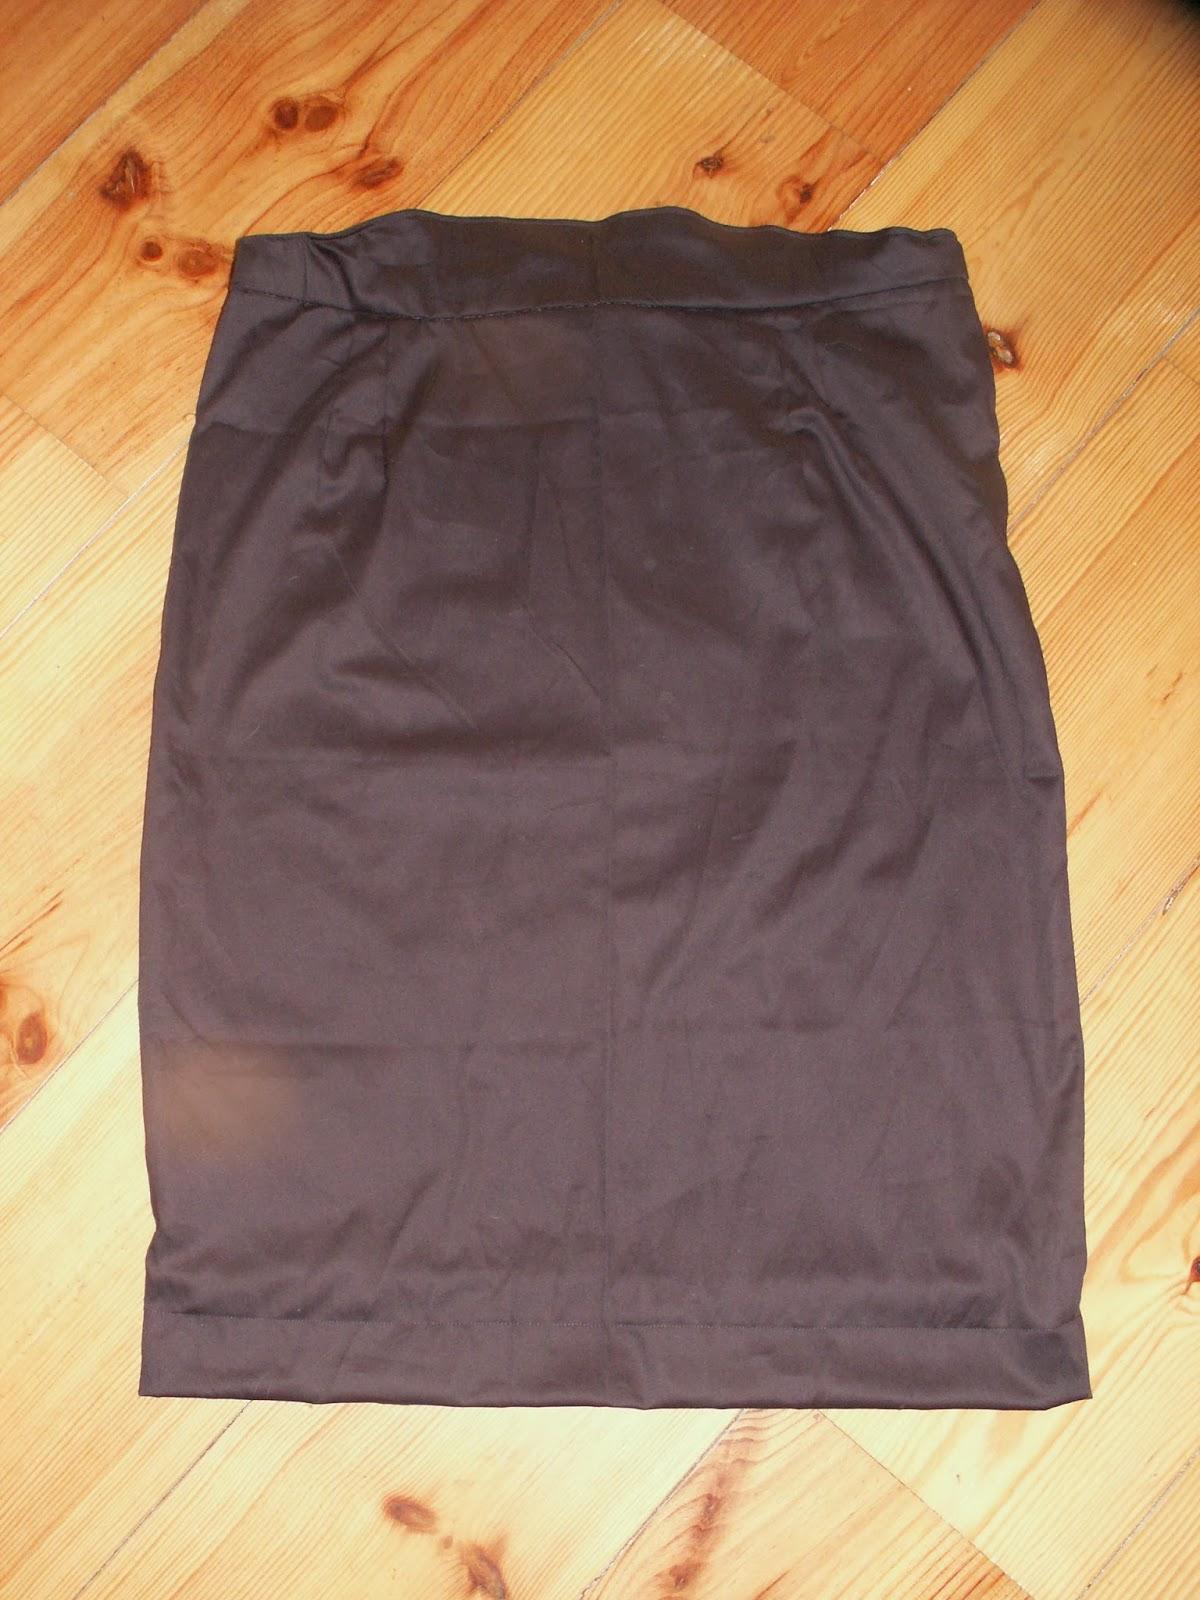 gertie s pencil skirt